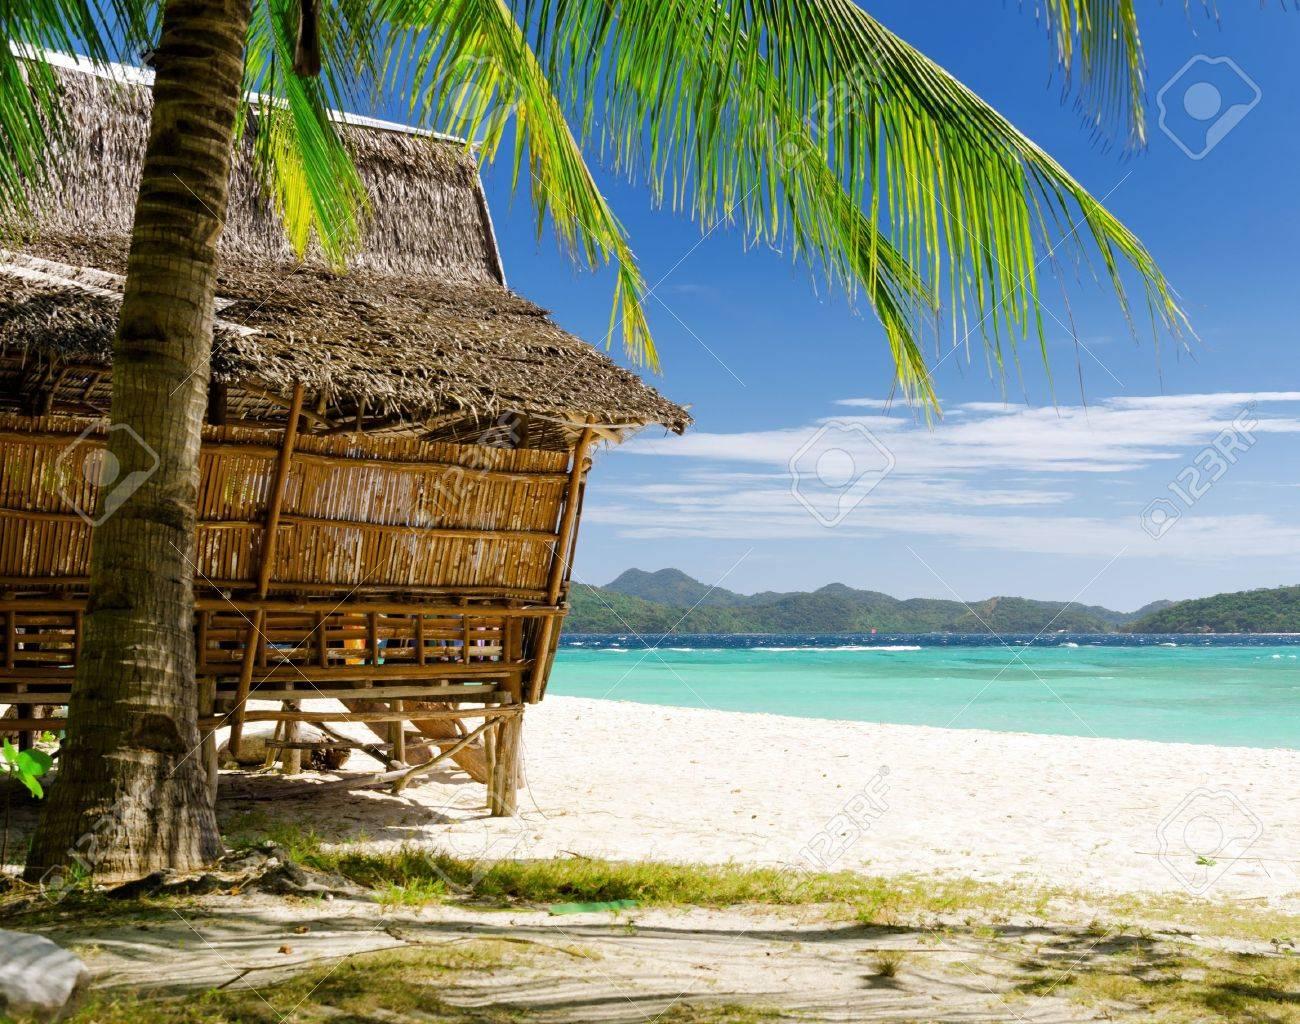 Bamboo hut on a tropical beach. Stock Photo - 14398580